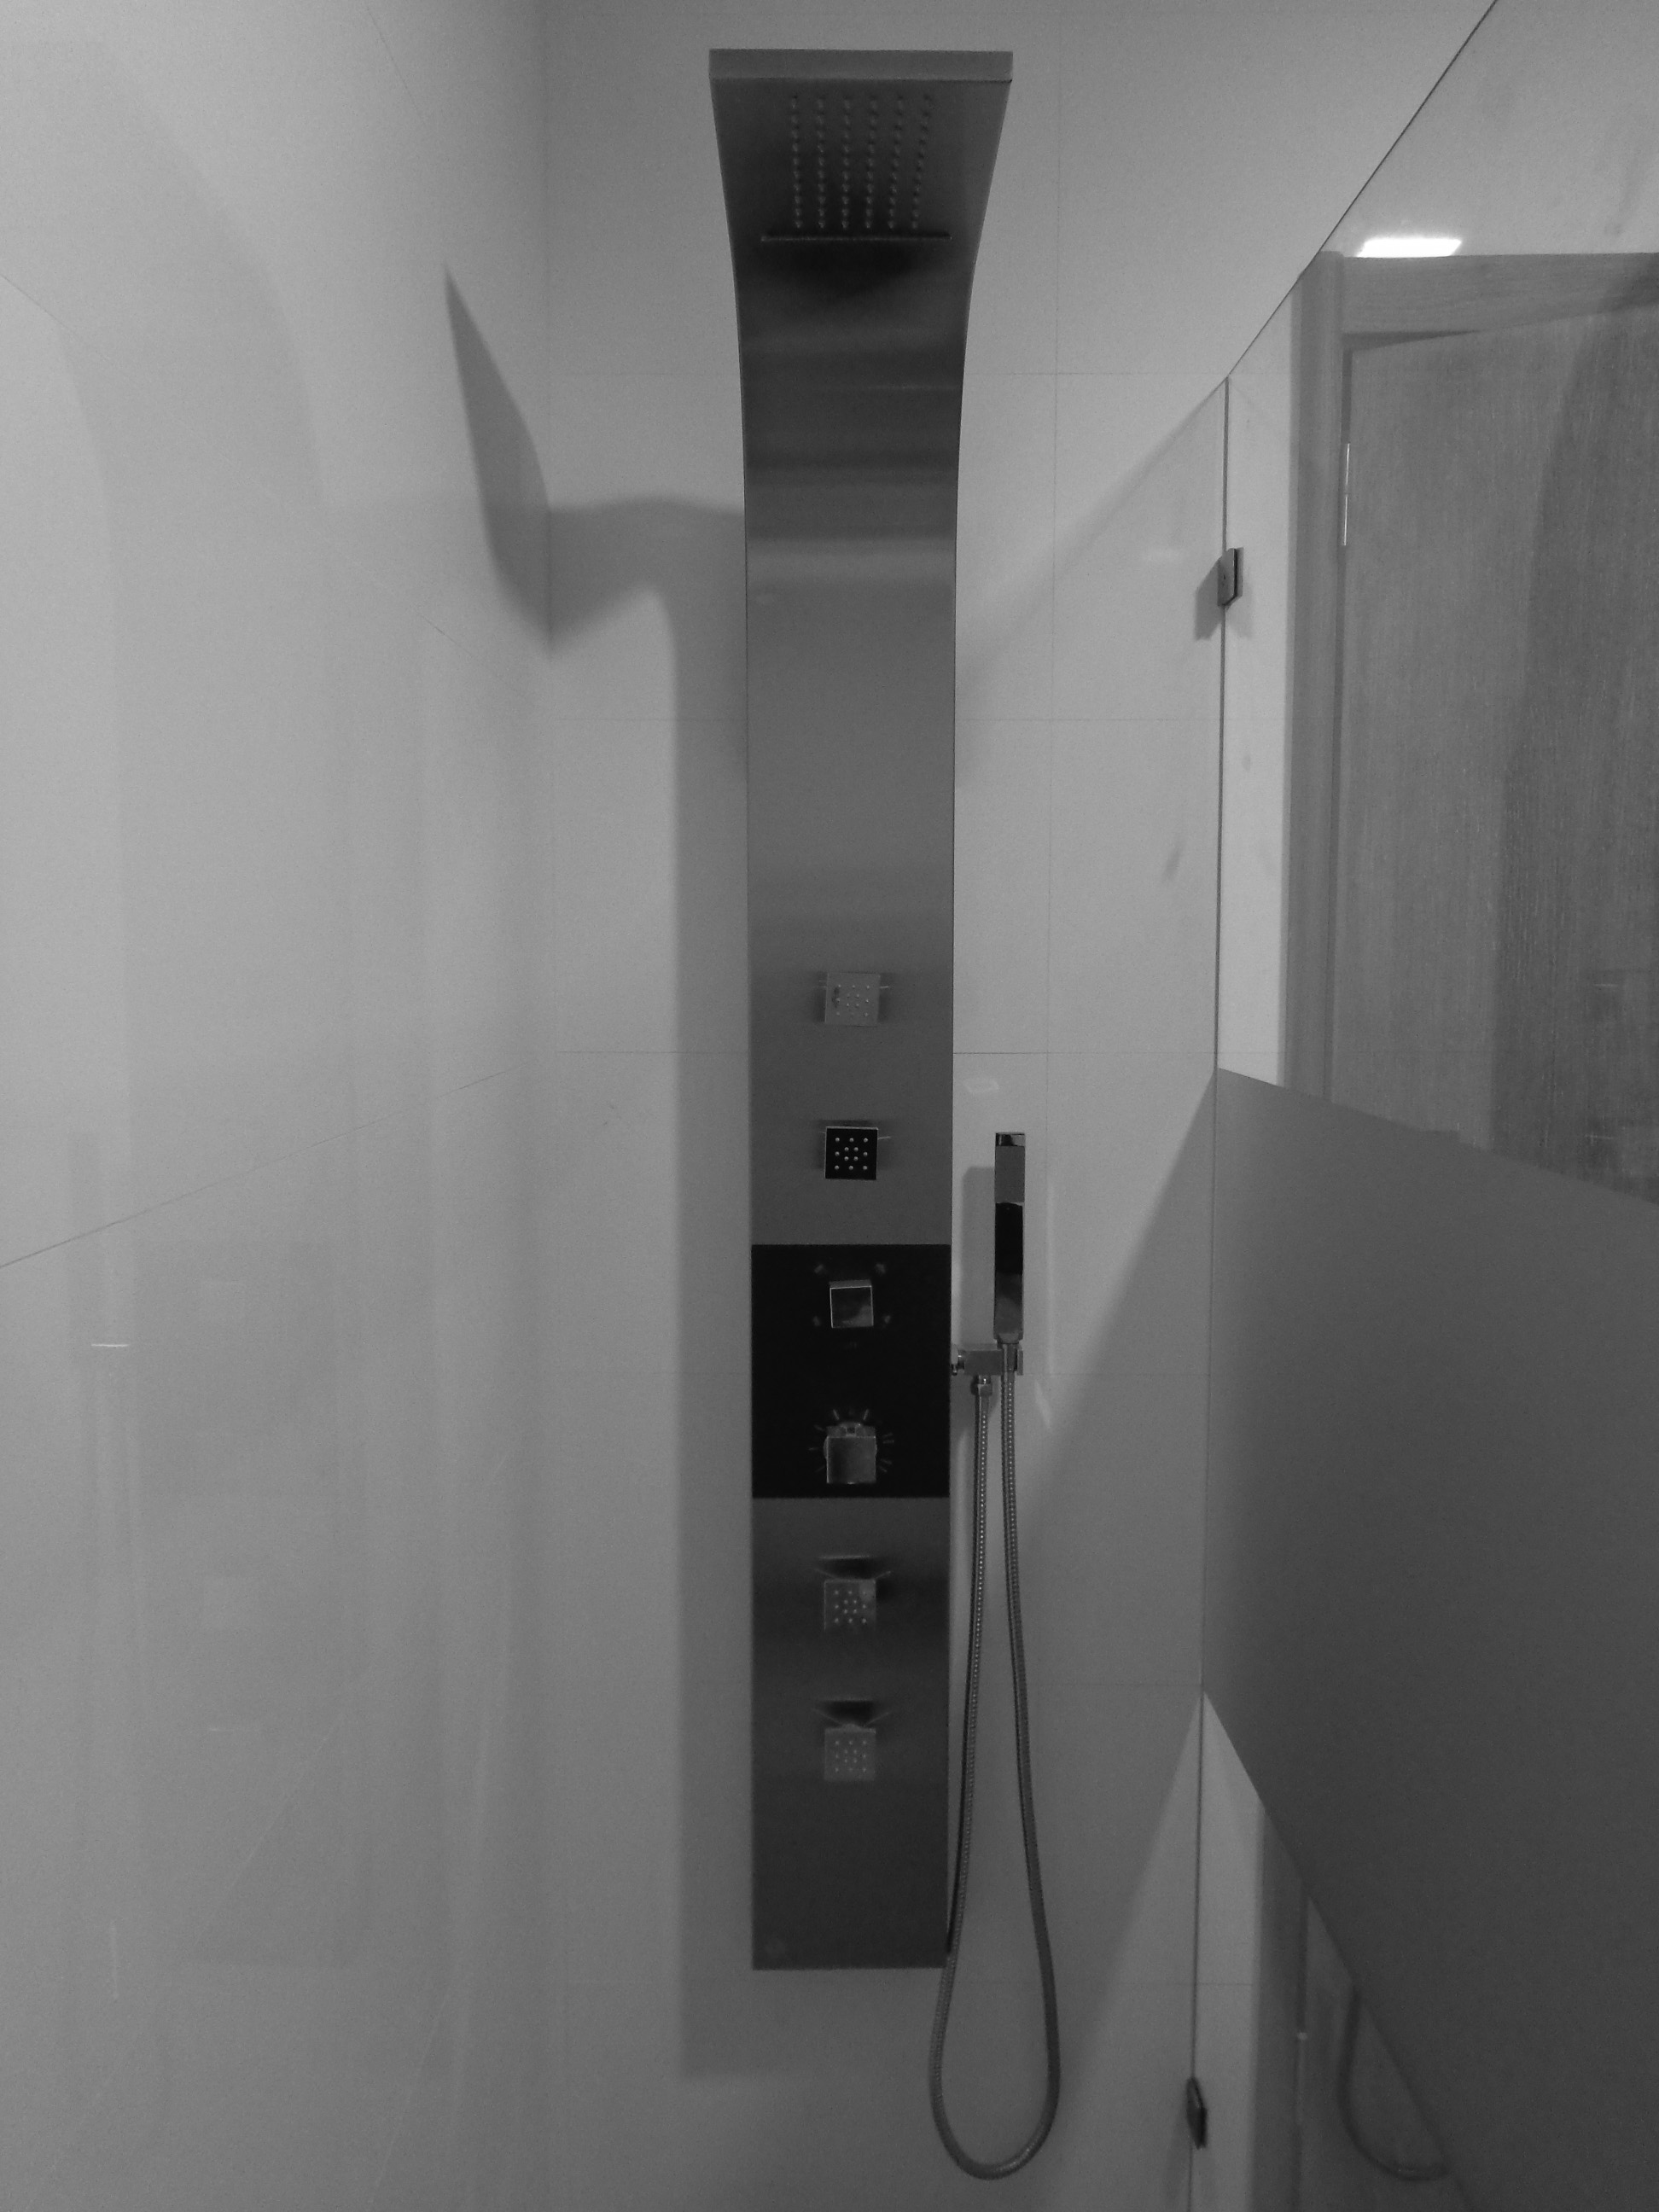 DSC07333.jpg